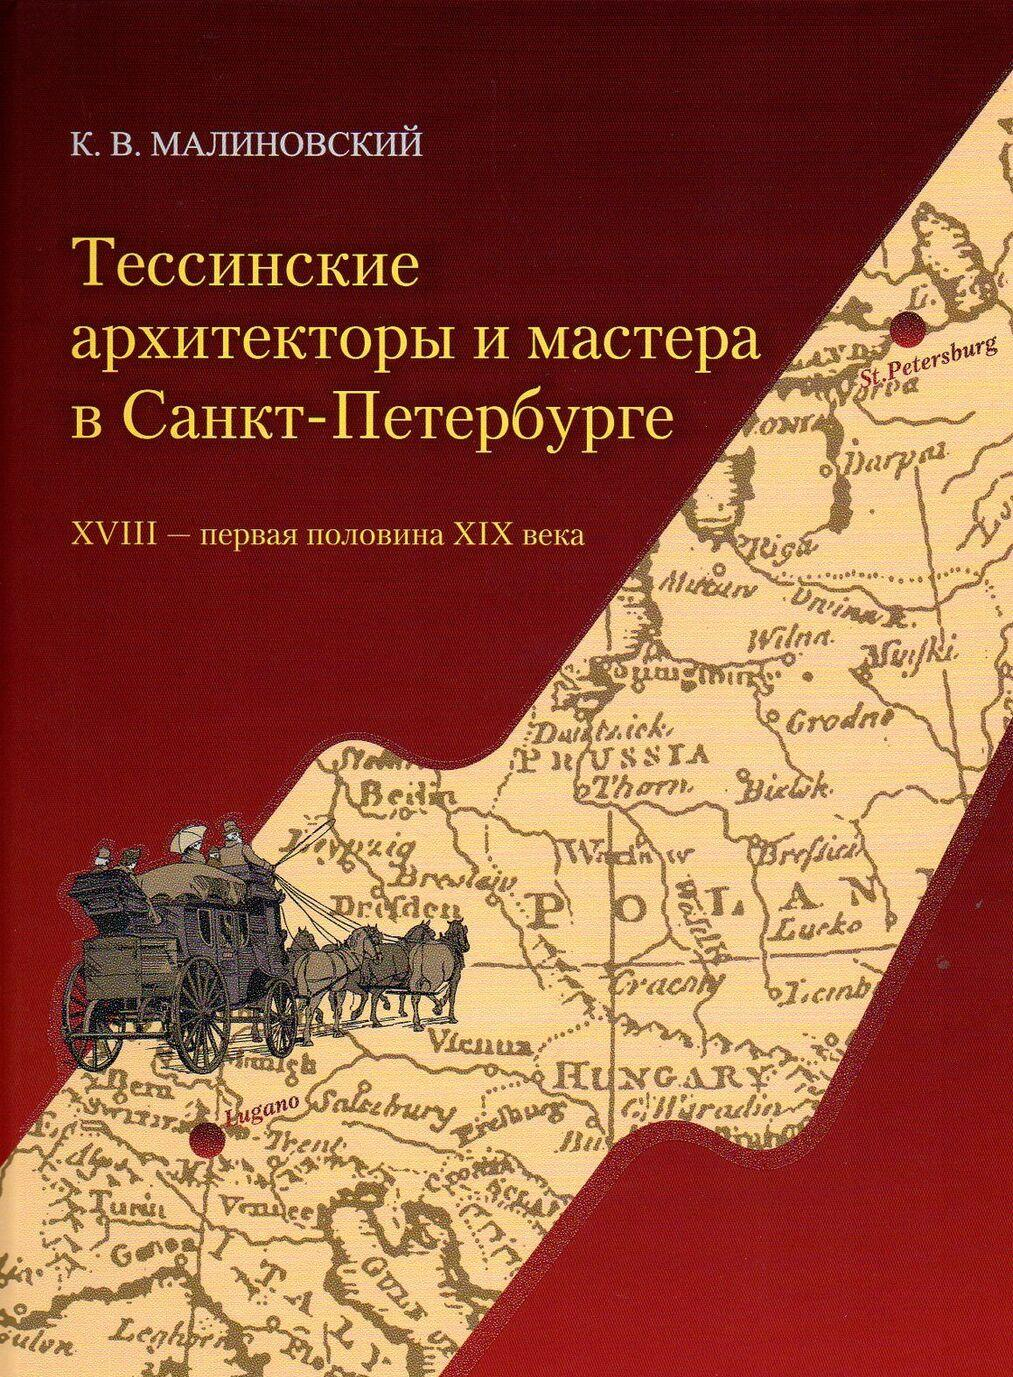 Tessinskie arkhitektory i mastera v Sankt-Peterburge. XVIII - pervaja polovina XIX veka